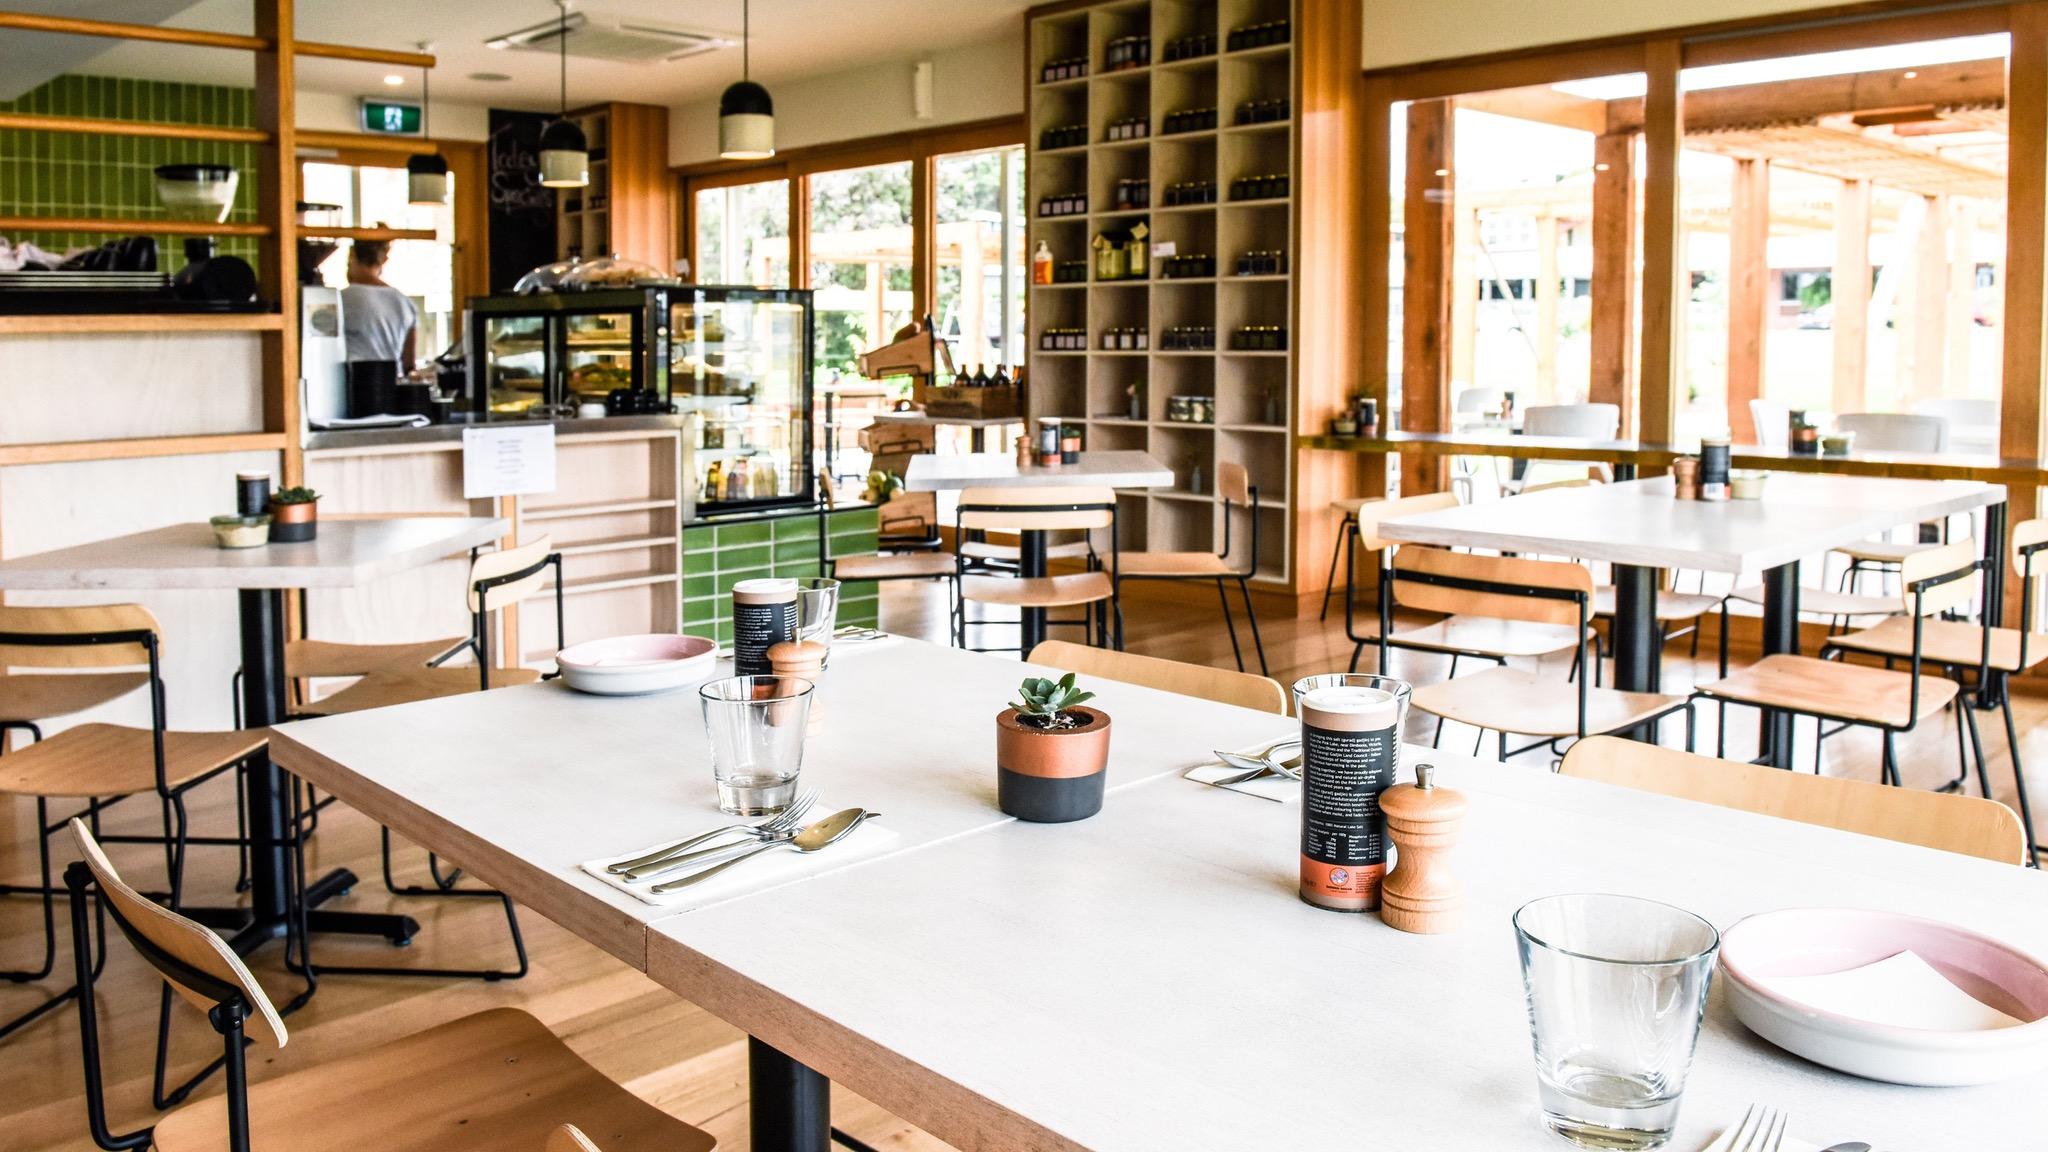 Georgie Bass Café and Cookery